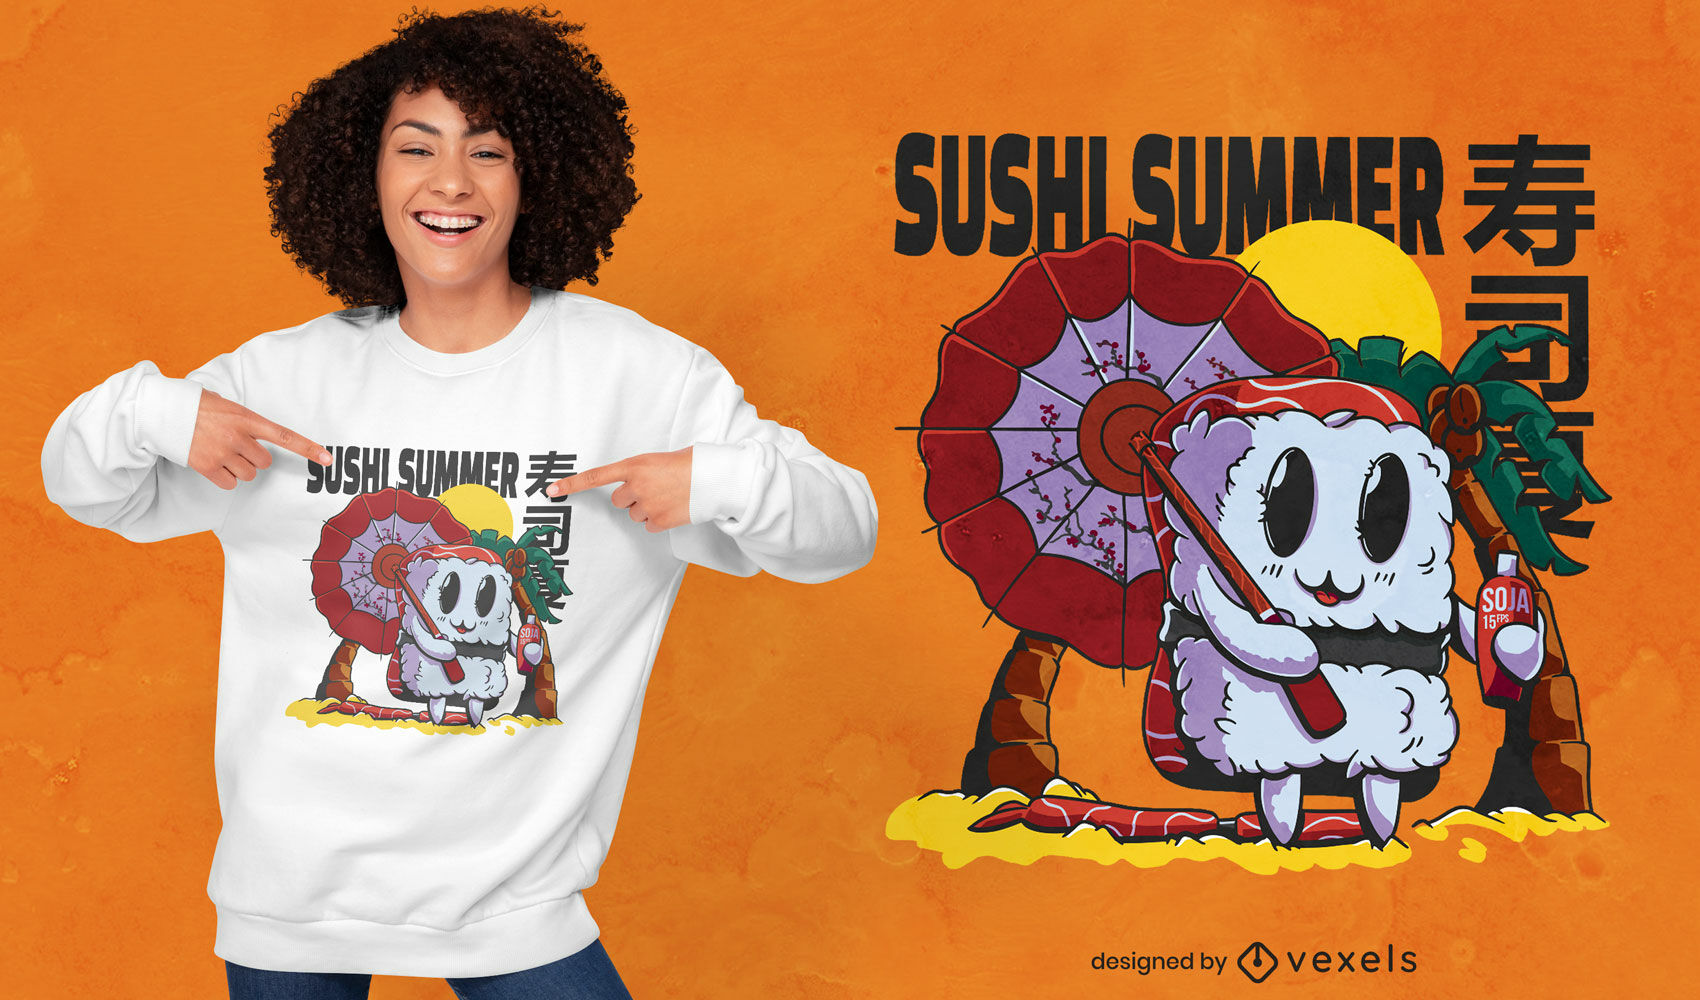 Beach sushi cartoon food t-shirt design